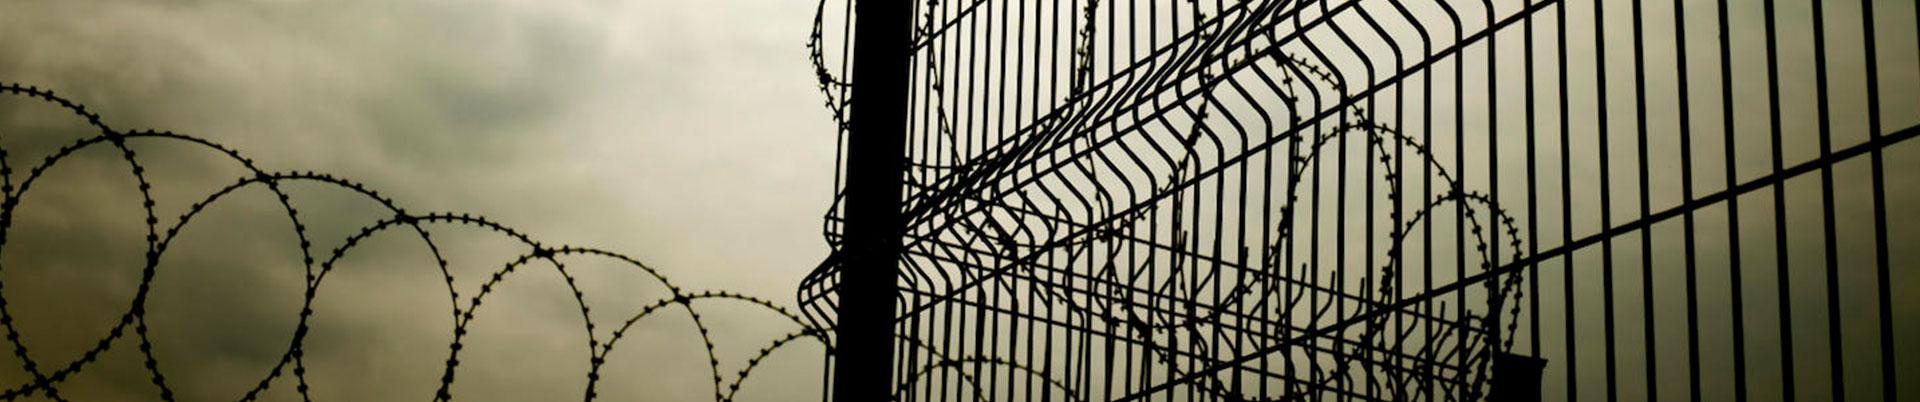 Jail Management System